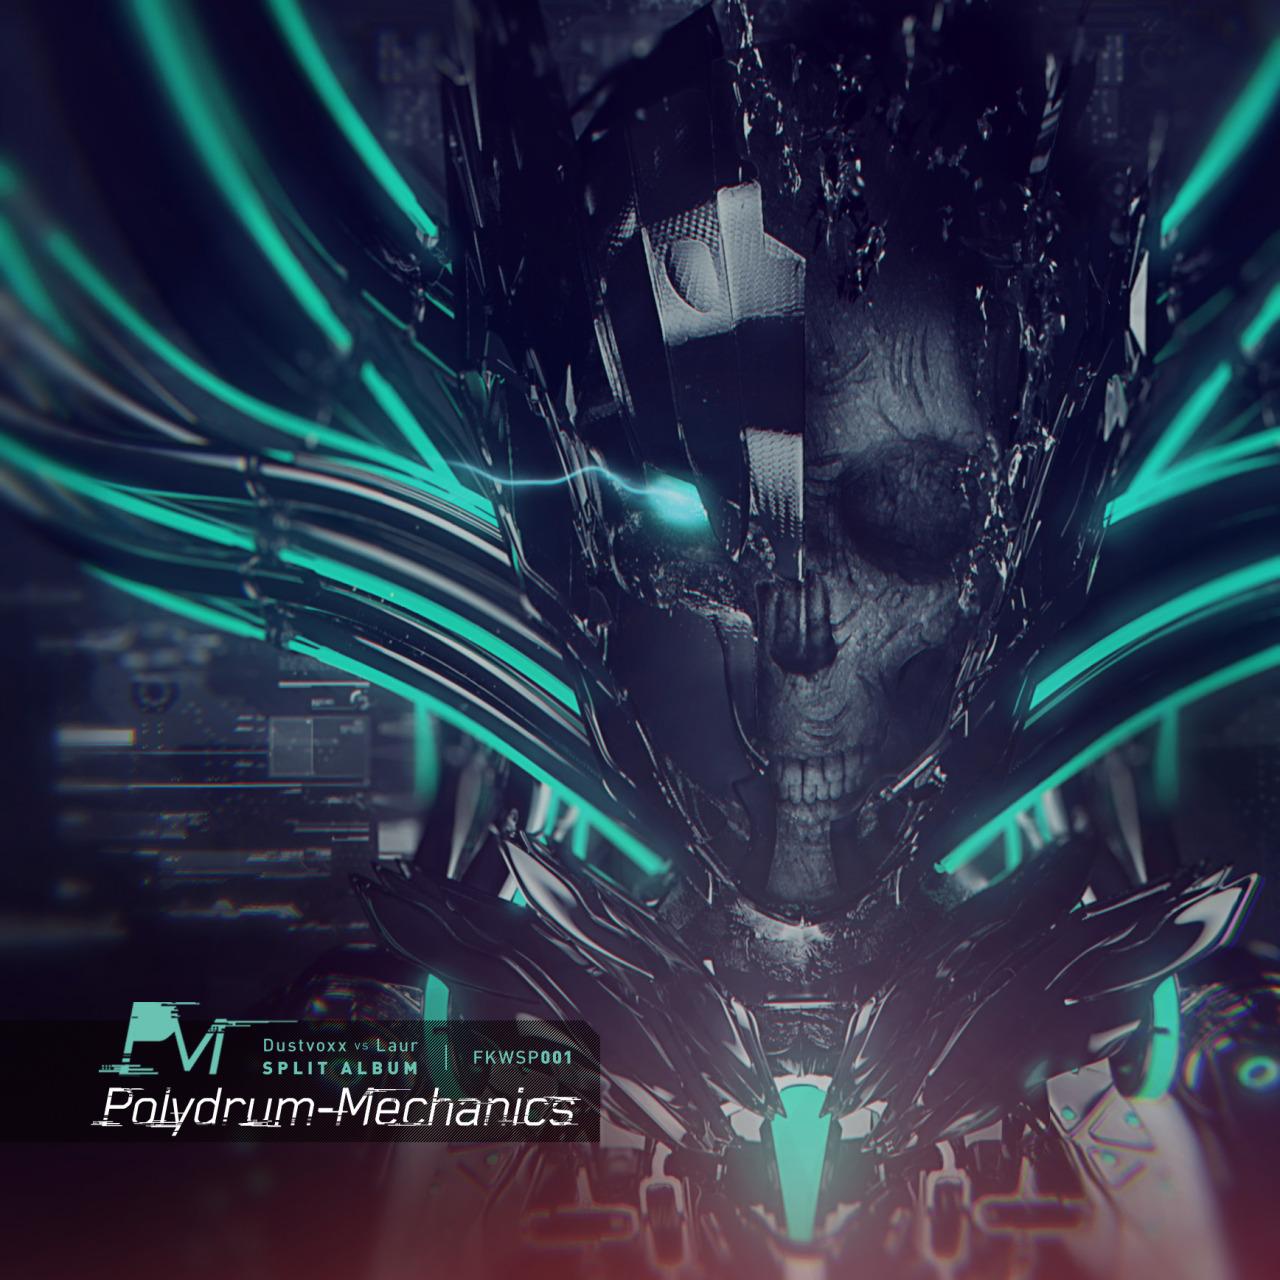 Polydrum-Mechanics